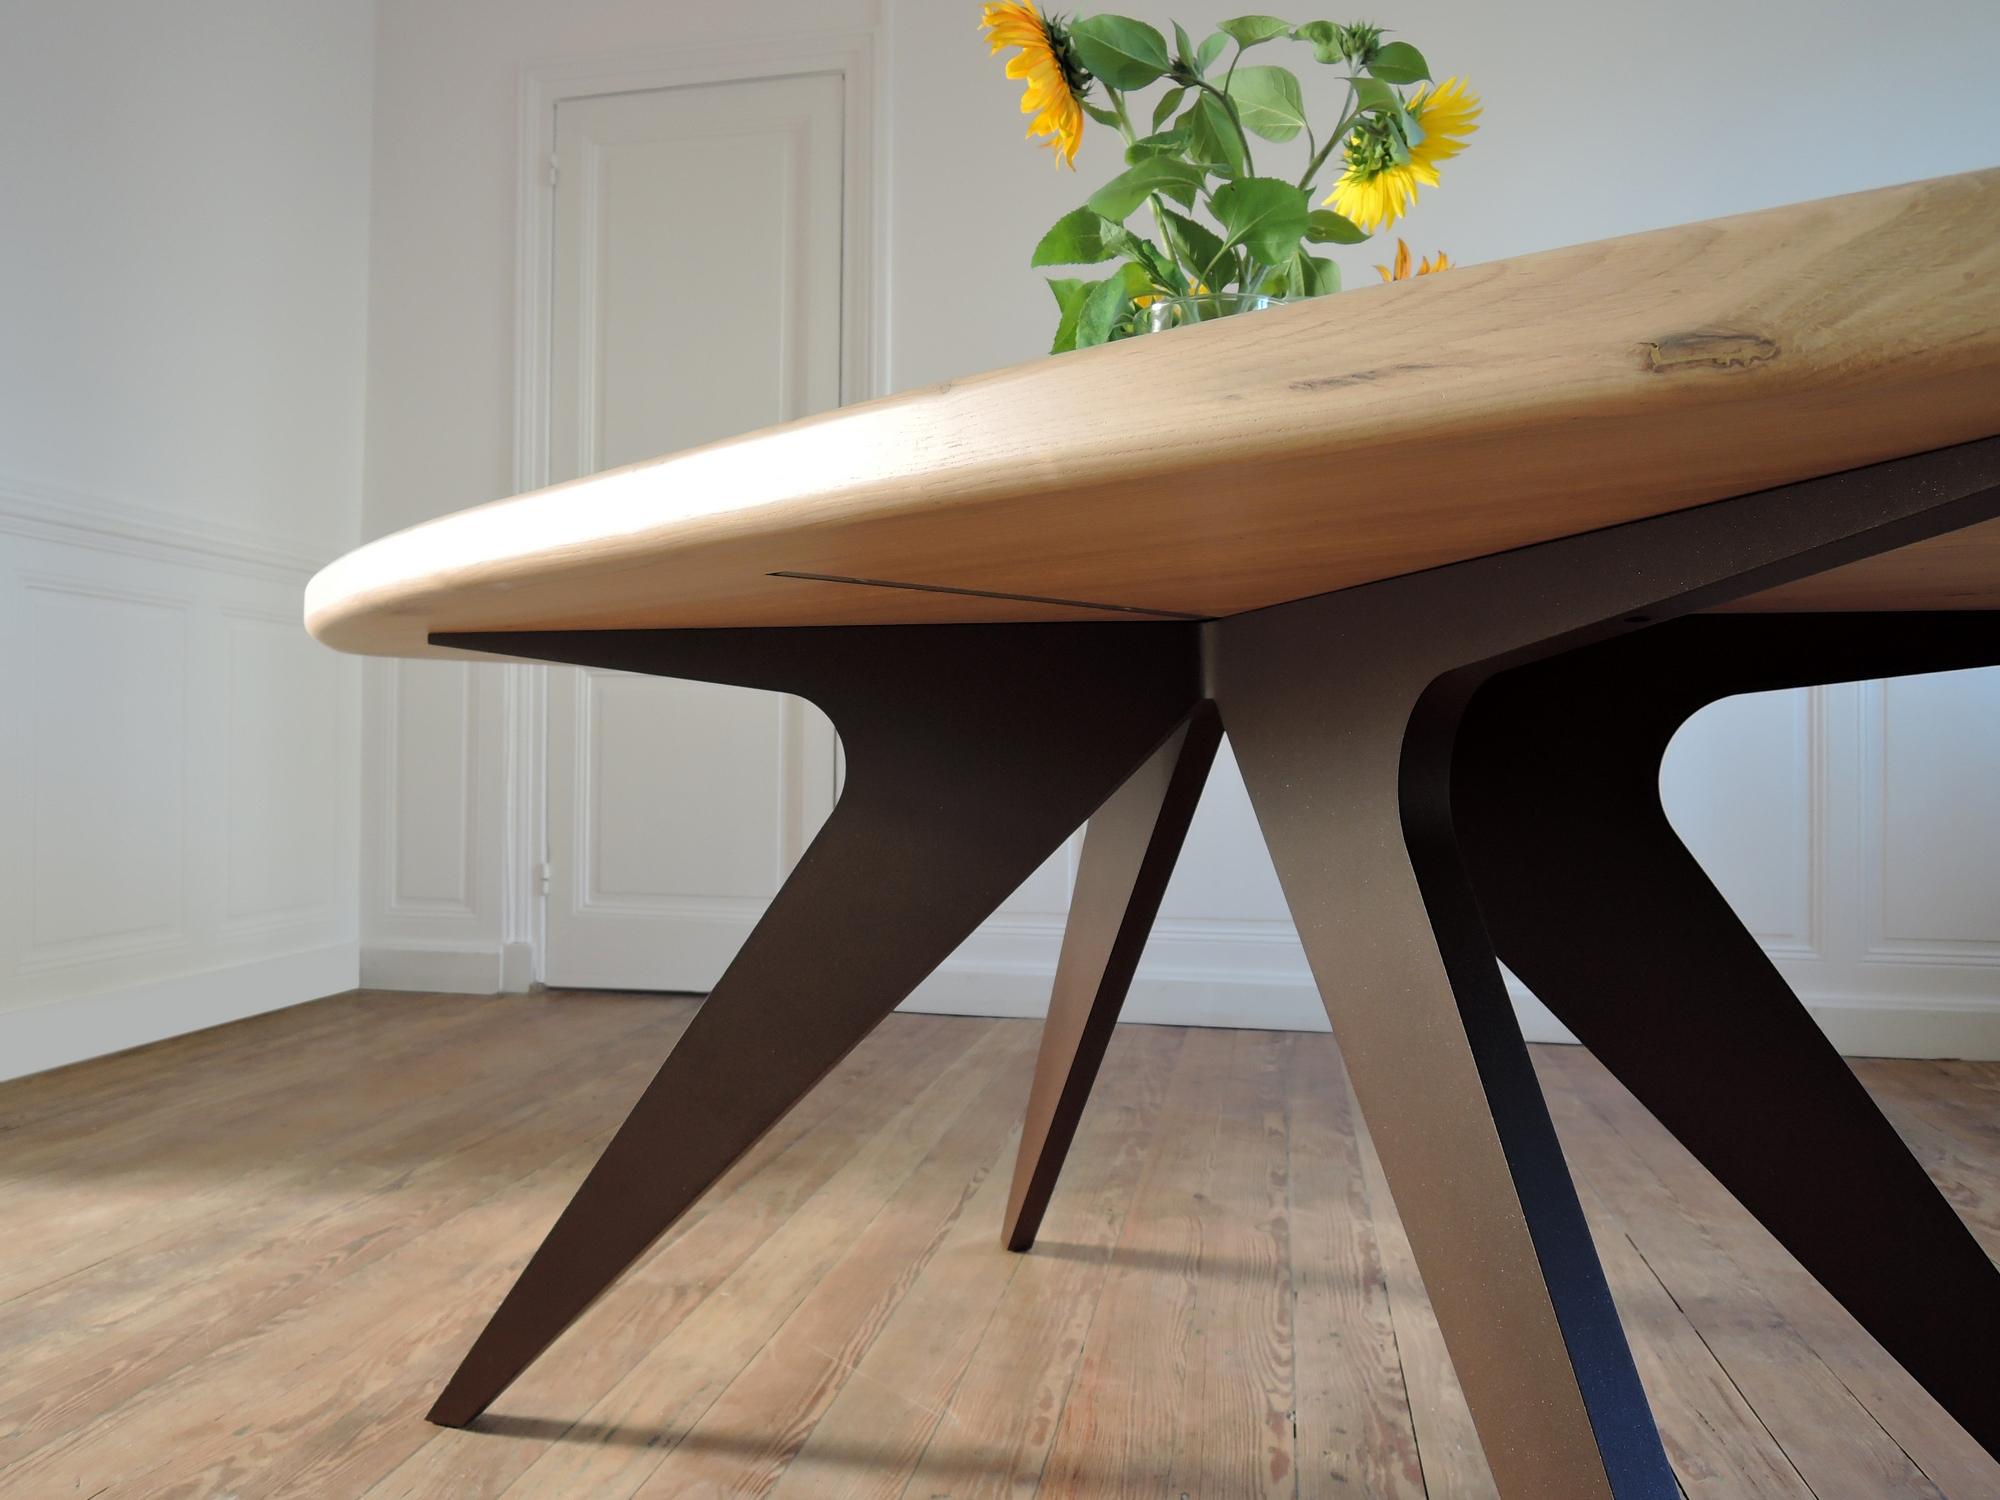 table m duse m tal et bois massif design pur fabrication artisanale. Black Bedroom Furniture Sets. Home Design Ideas